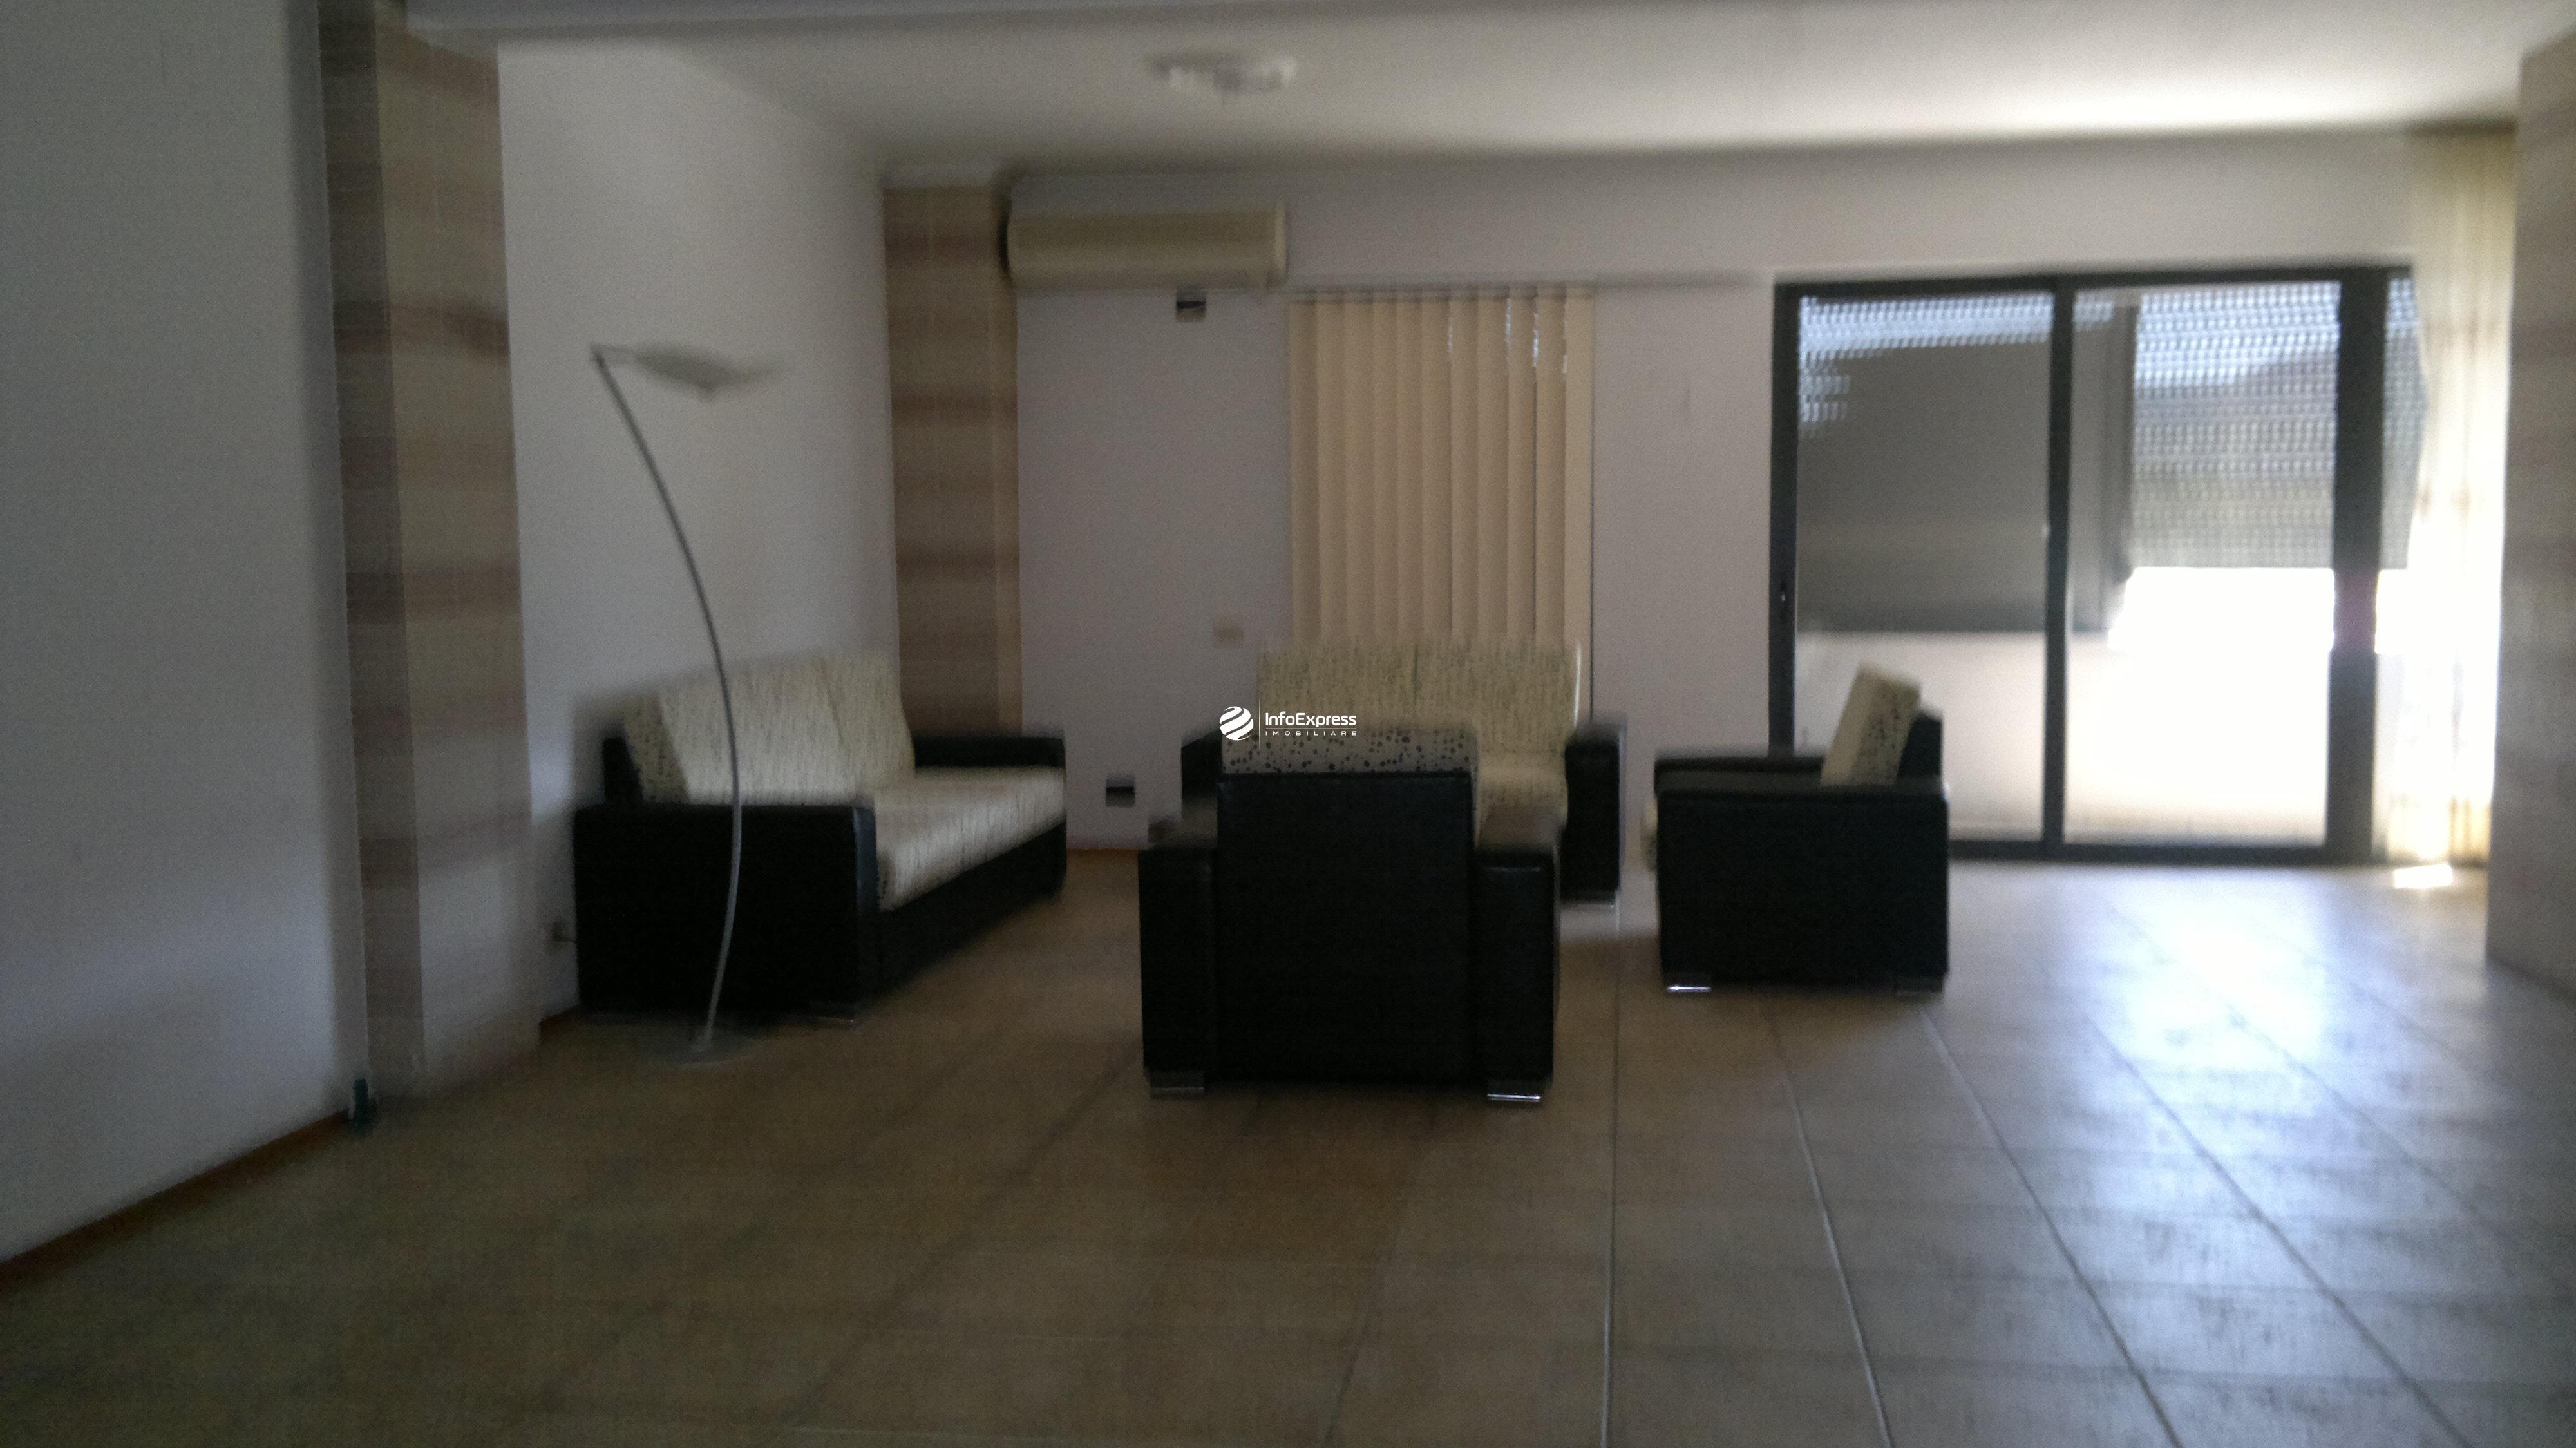 TRR-0419-1429 Jepet me qera apartament 3+1 ndodhet prane Juveniljes , Venecias , Lion Park.